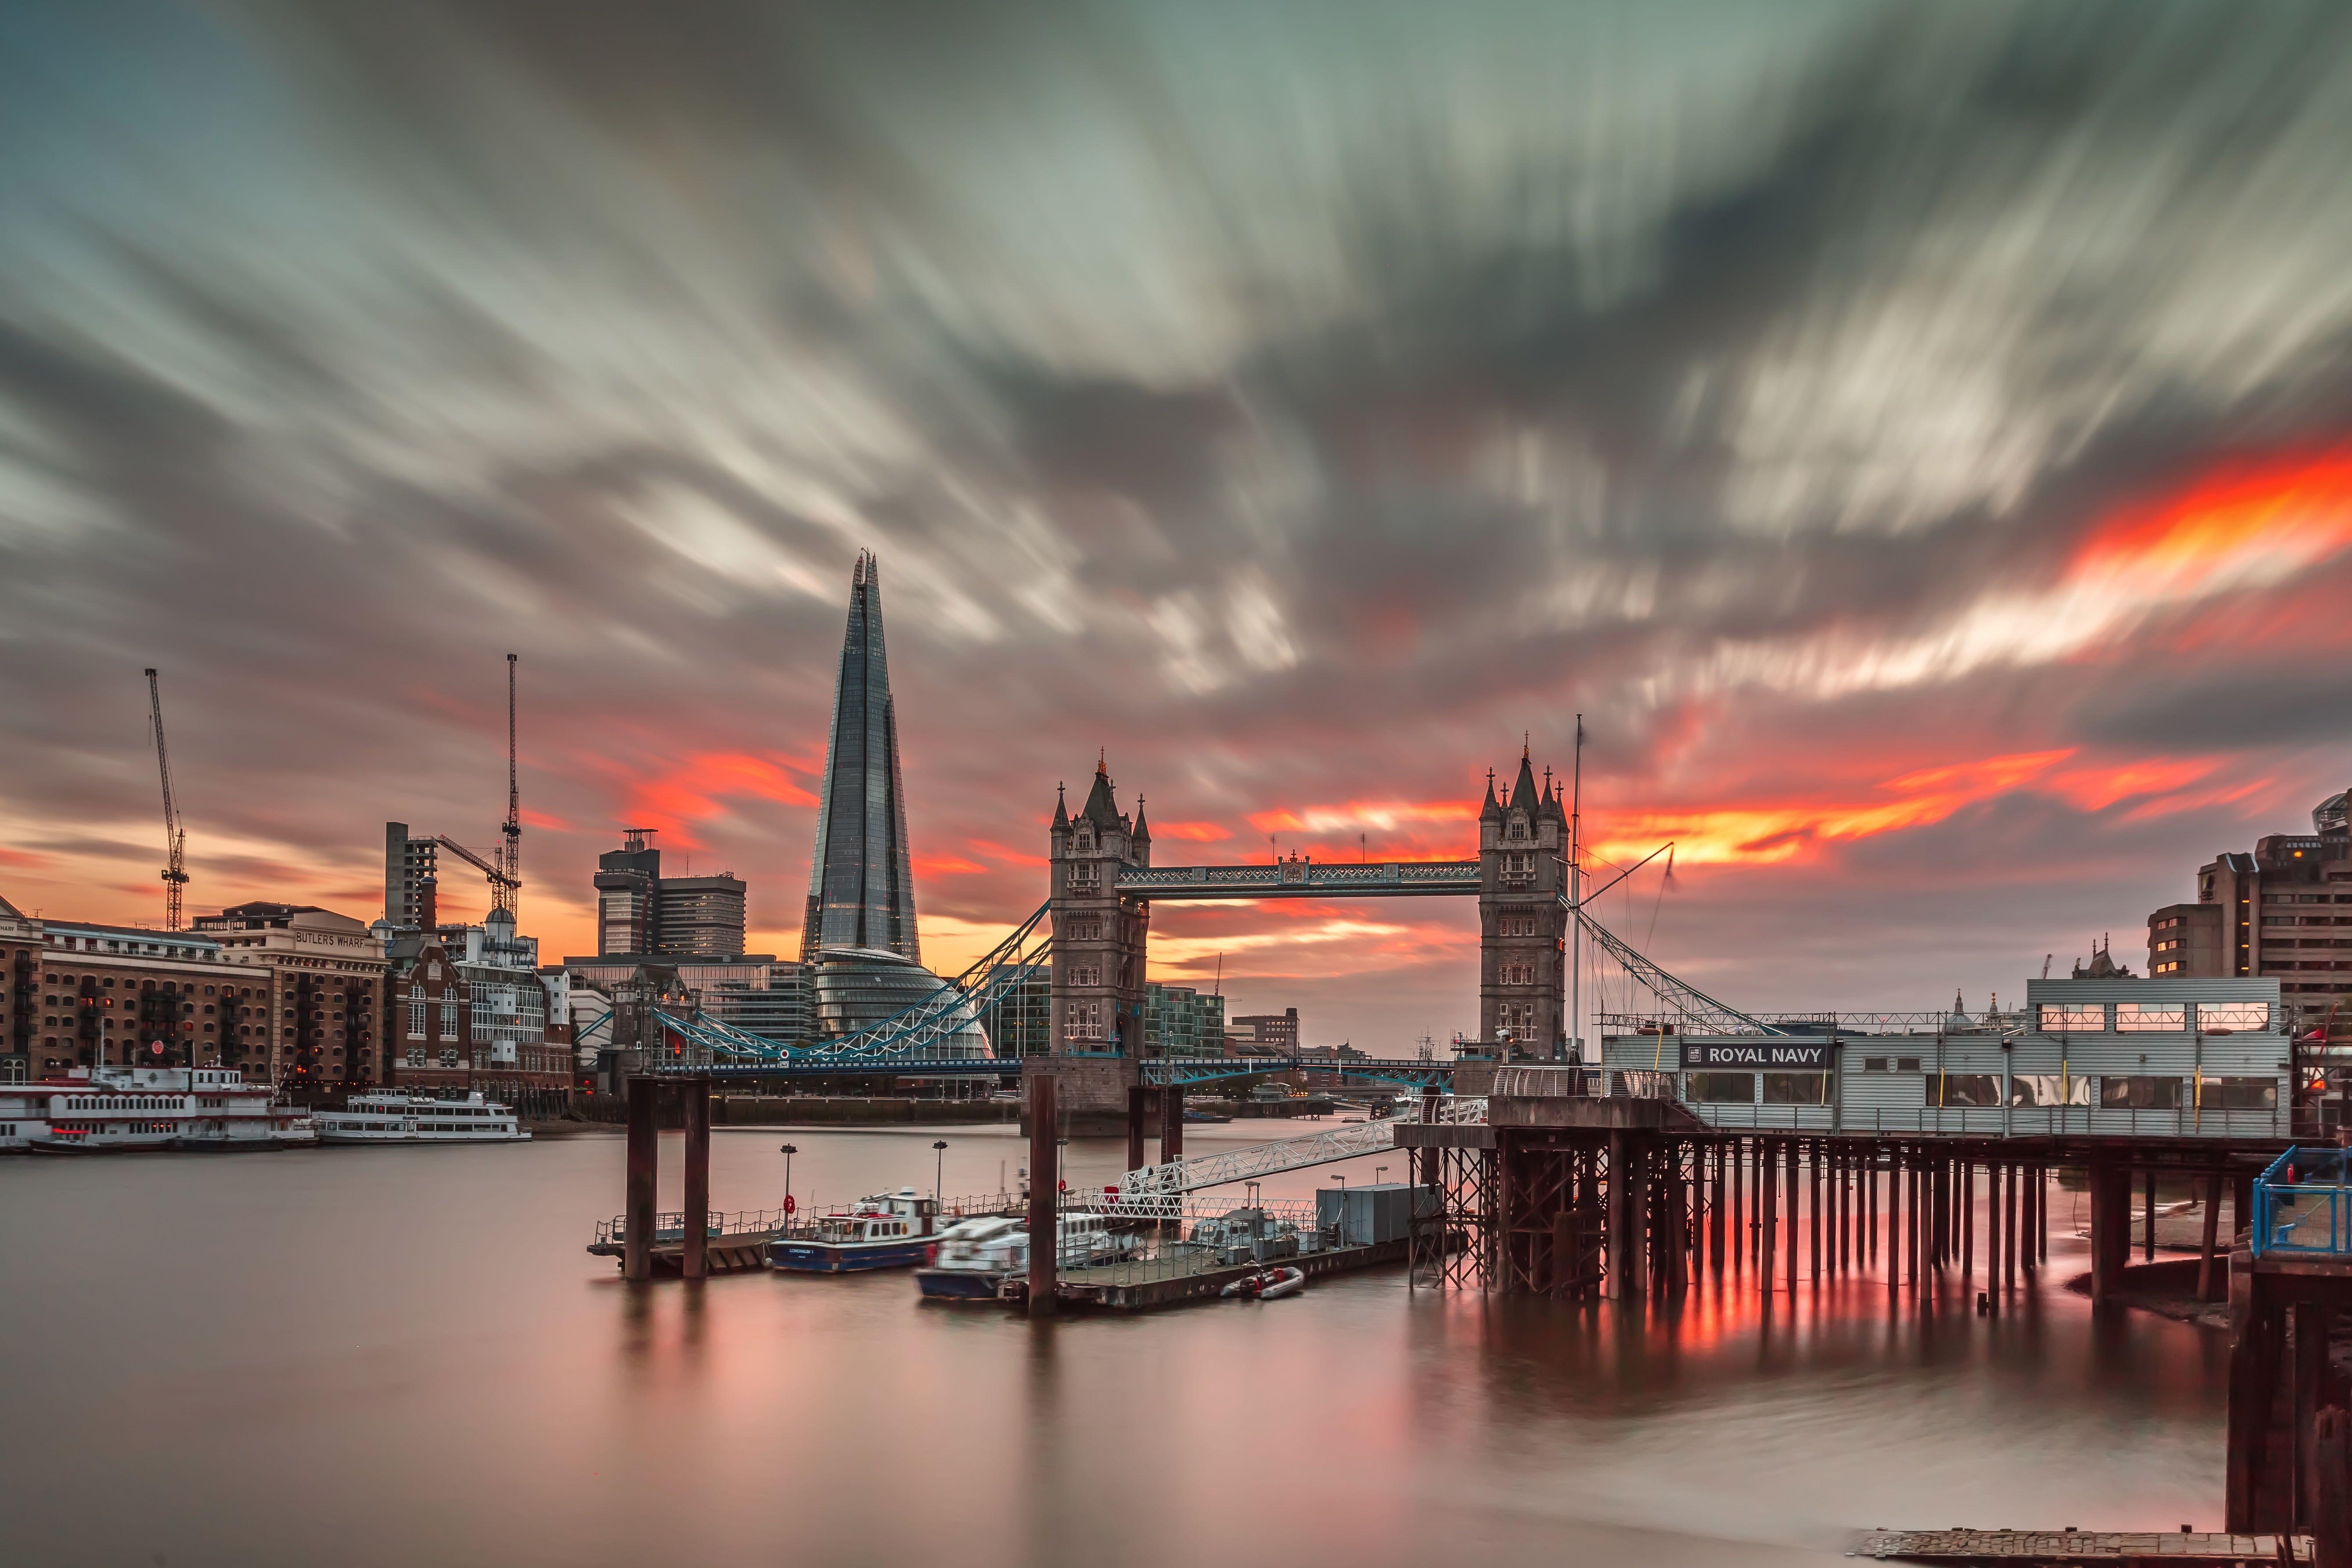 wallpaper london, england, europe, travel, tourism, sunset